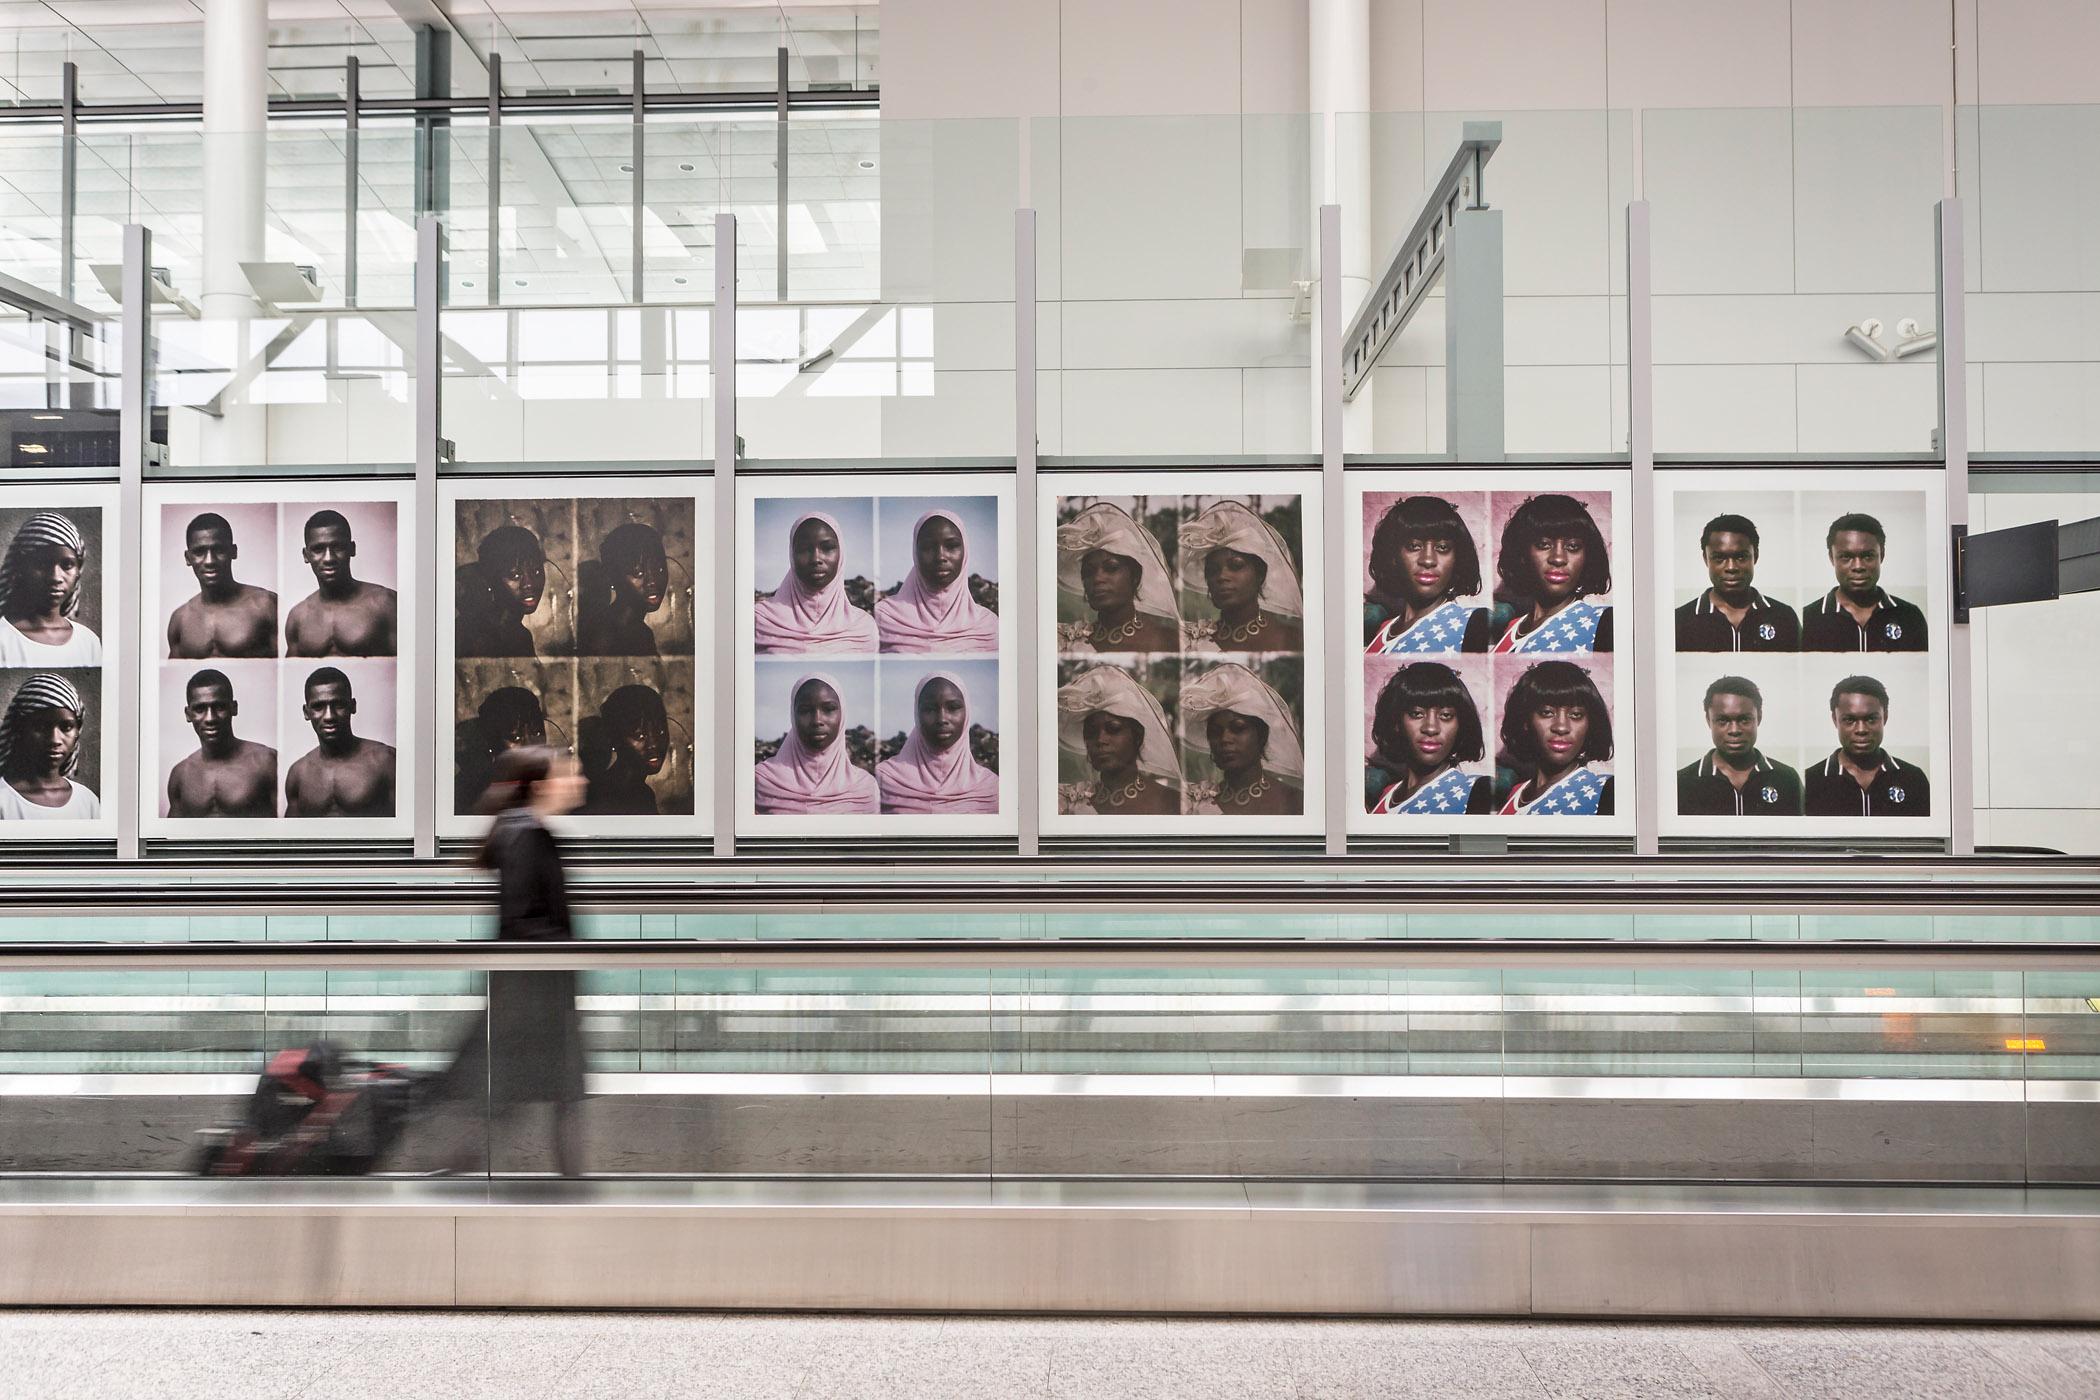 Installation view of Émilie Régnier Passport at Pearson International Airport, ,  Photo: Toni Hafkenscheid